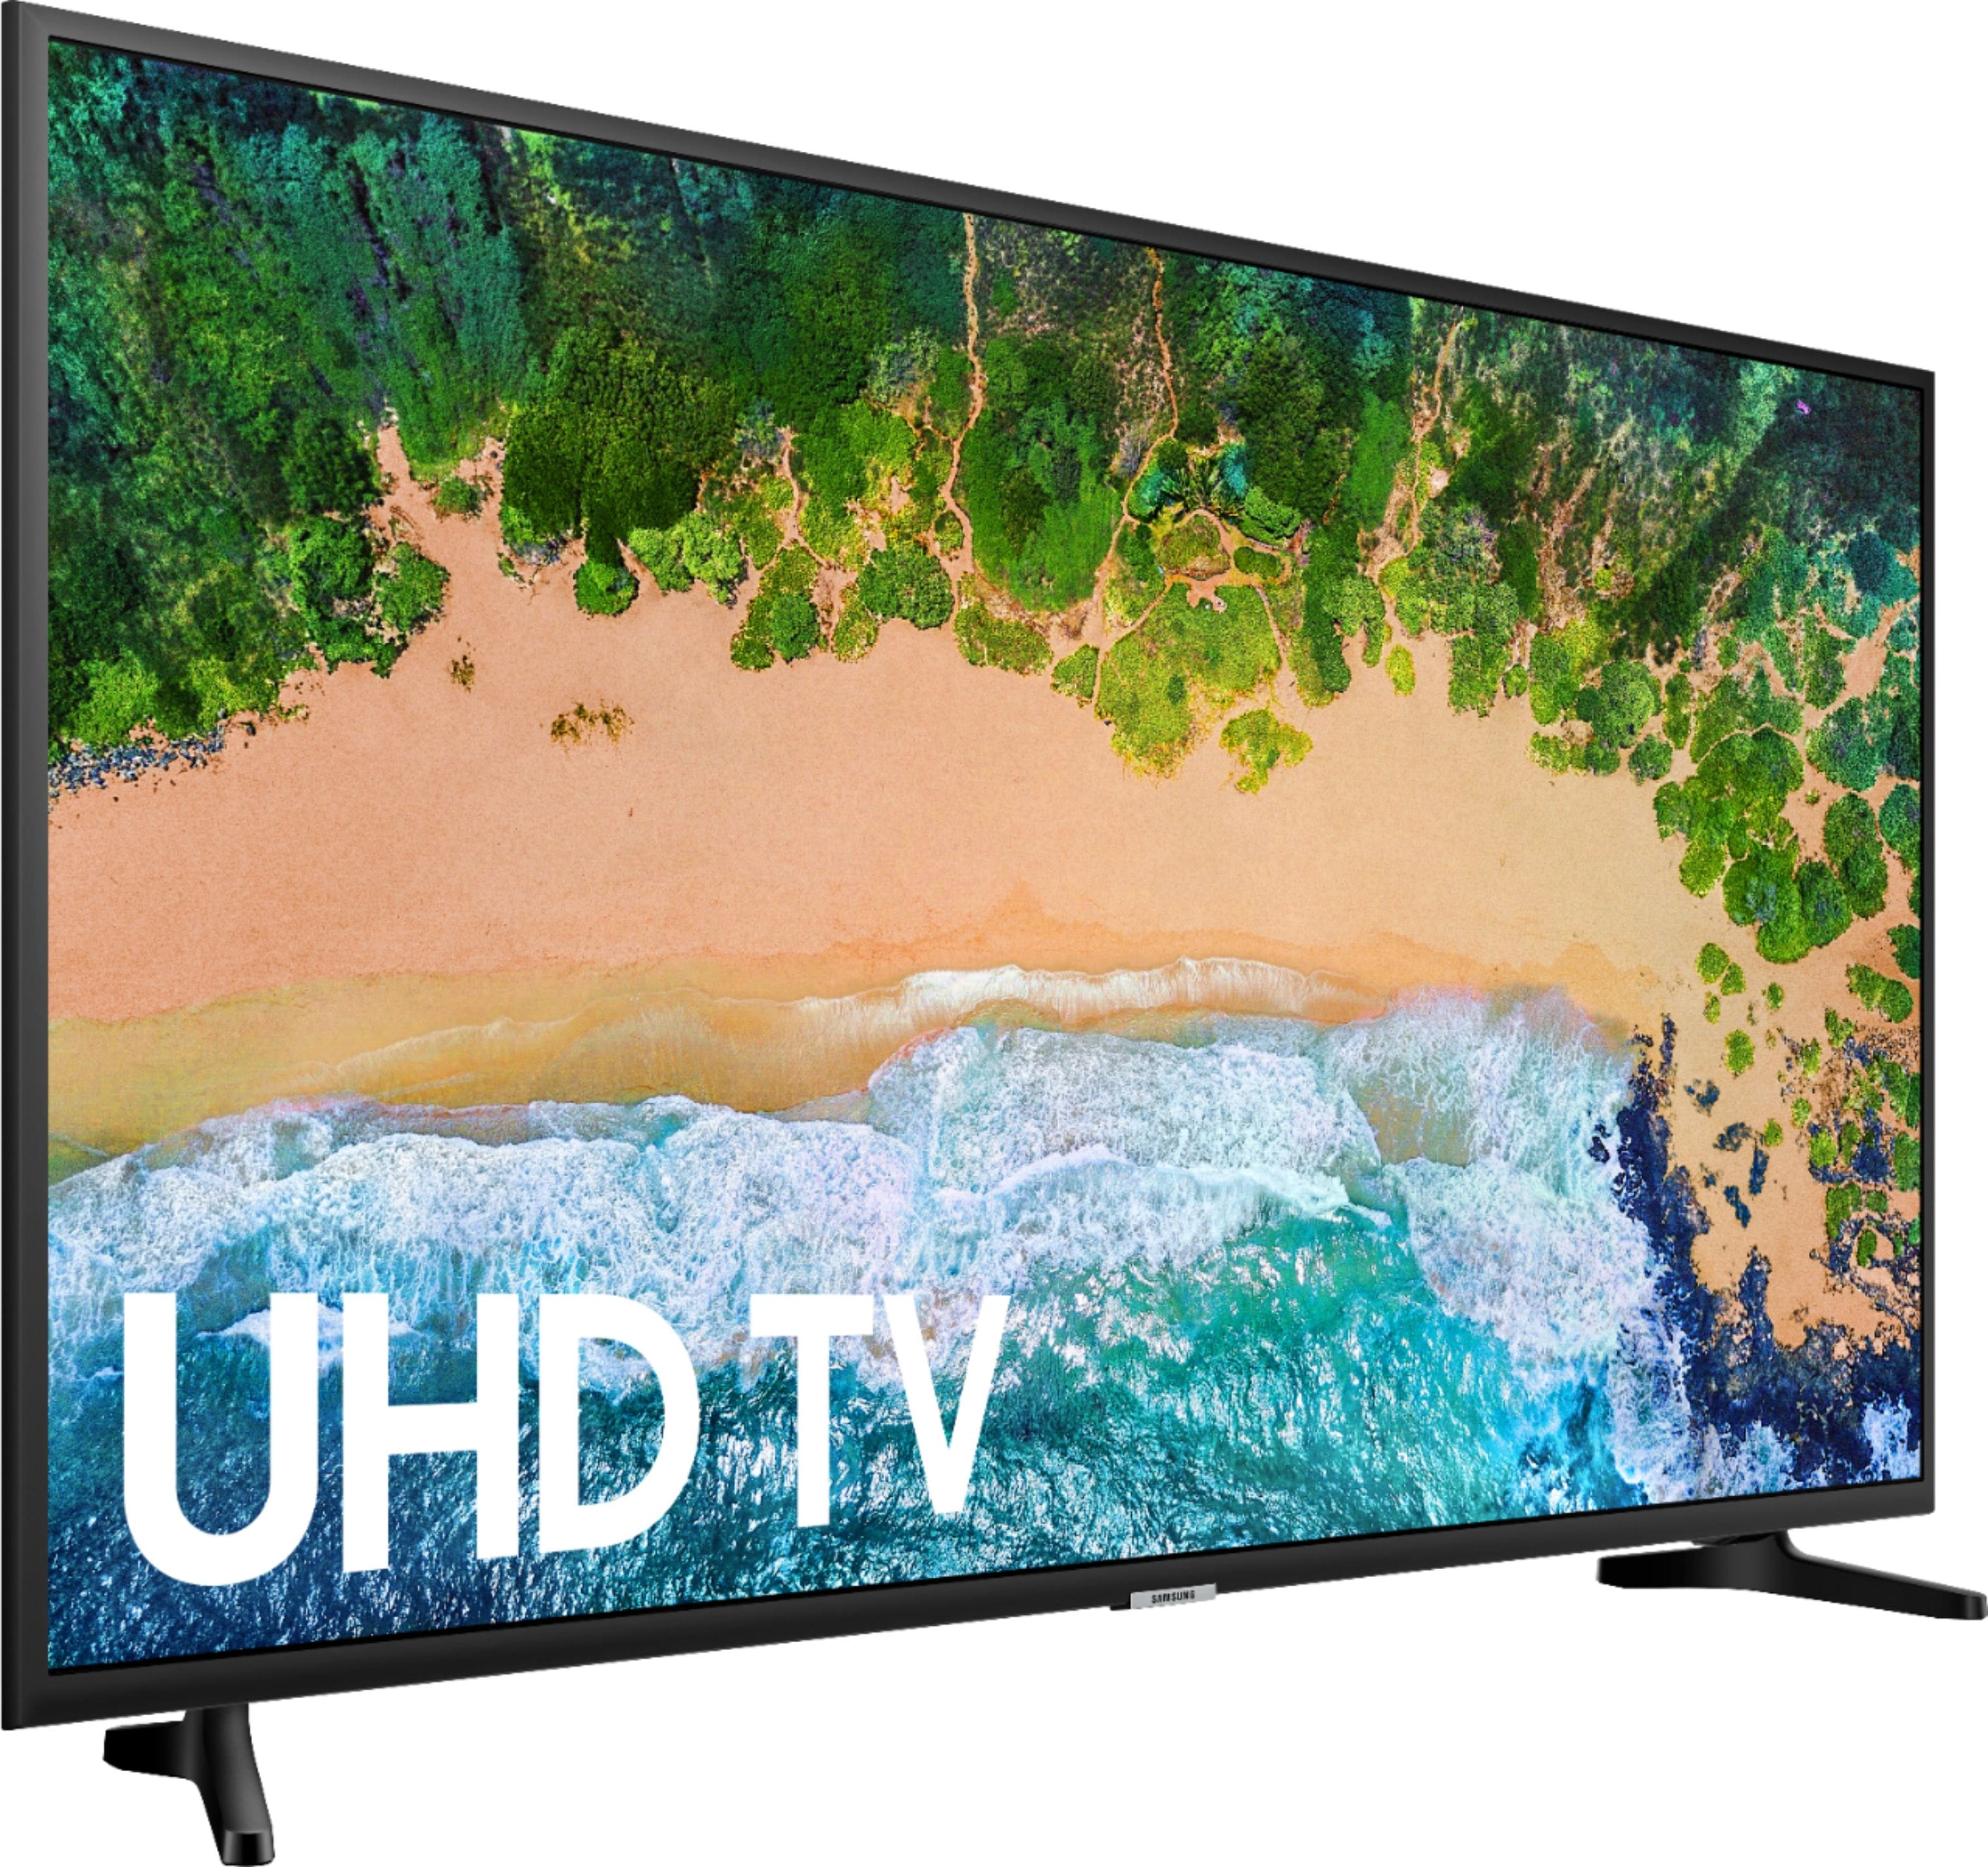 "Samsung 65"" Class LED NU6900 Series 2160p Smart 4K UHD TV with HDR UN65NU6900FXZA - Best Buy $550"